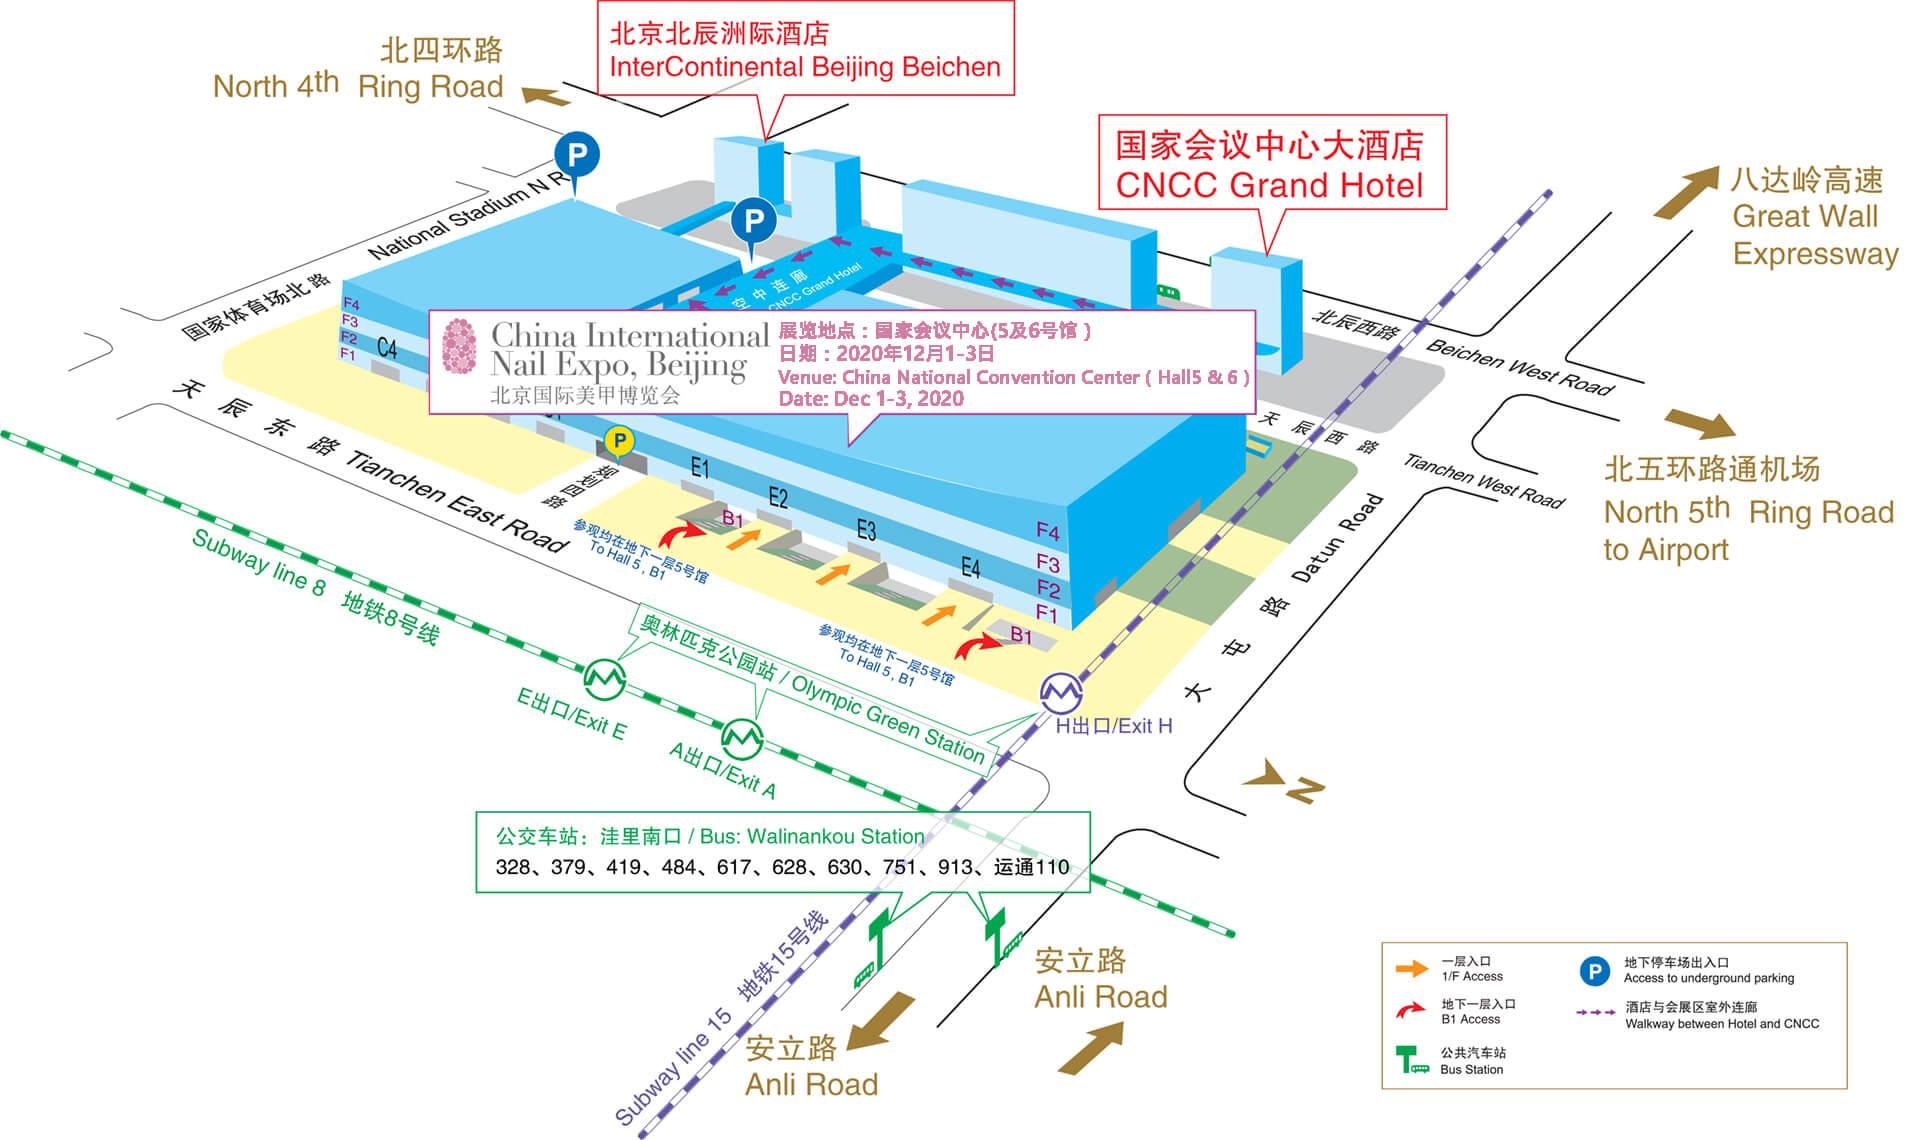 China International Nail Expo, Beijing – Exhibition Venue – China National Convention Center – Transportation Map